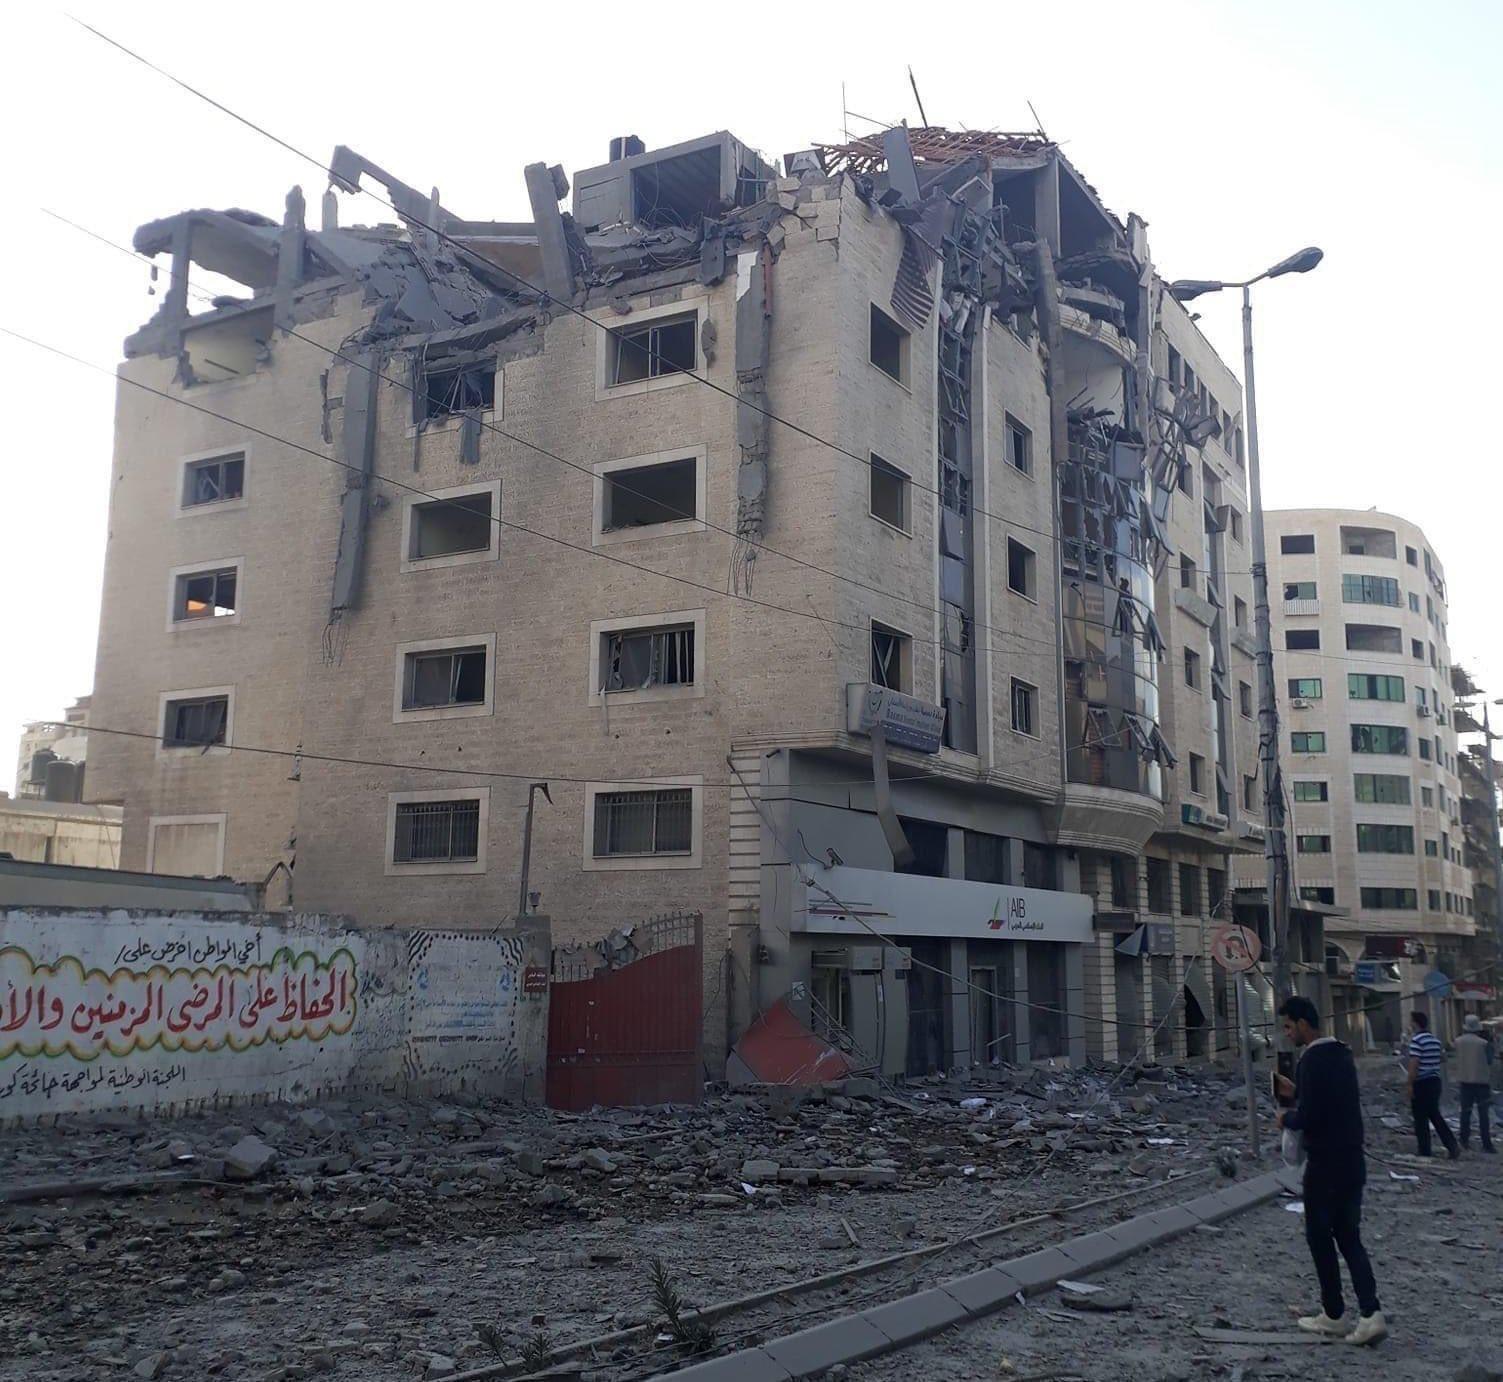 La sede del Pcrf colpita ieri a Gaza City (Fonte: Pcrf/Twitter)